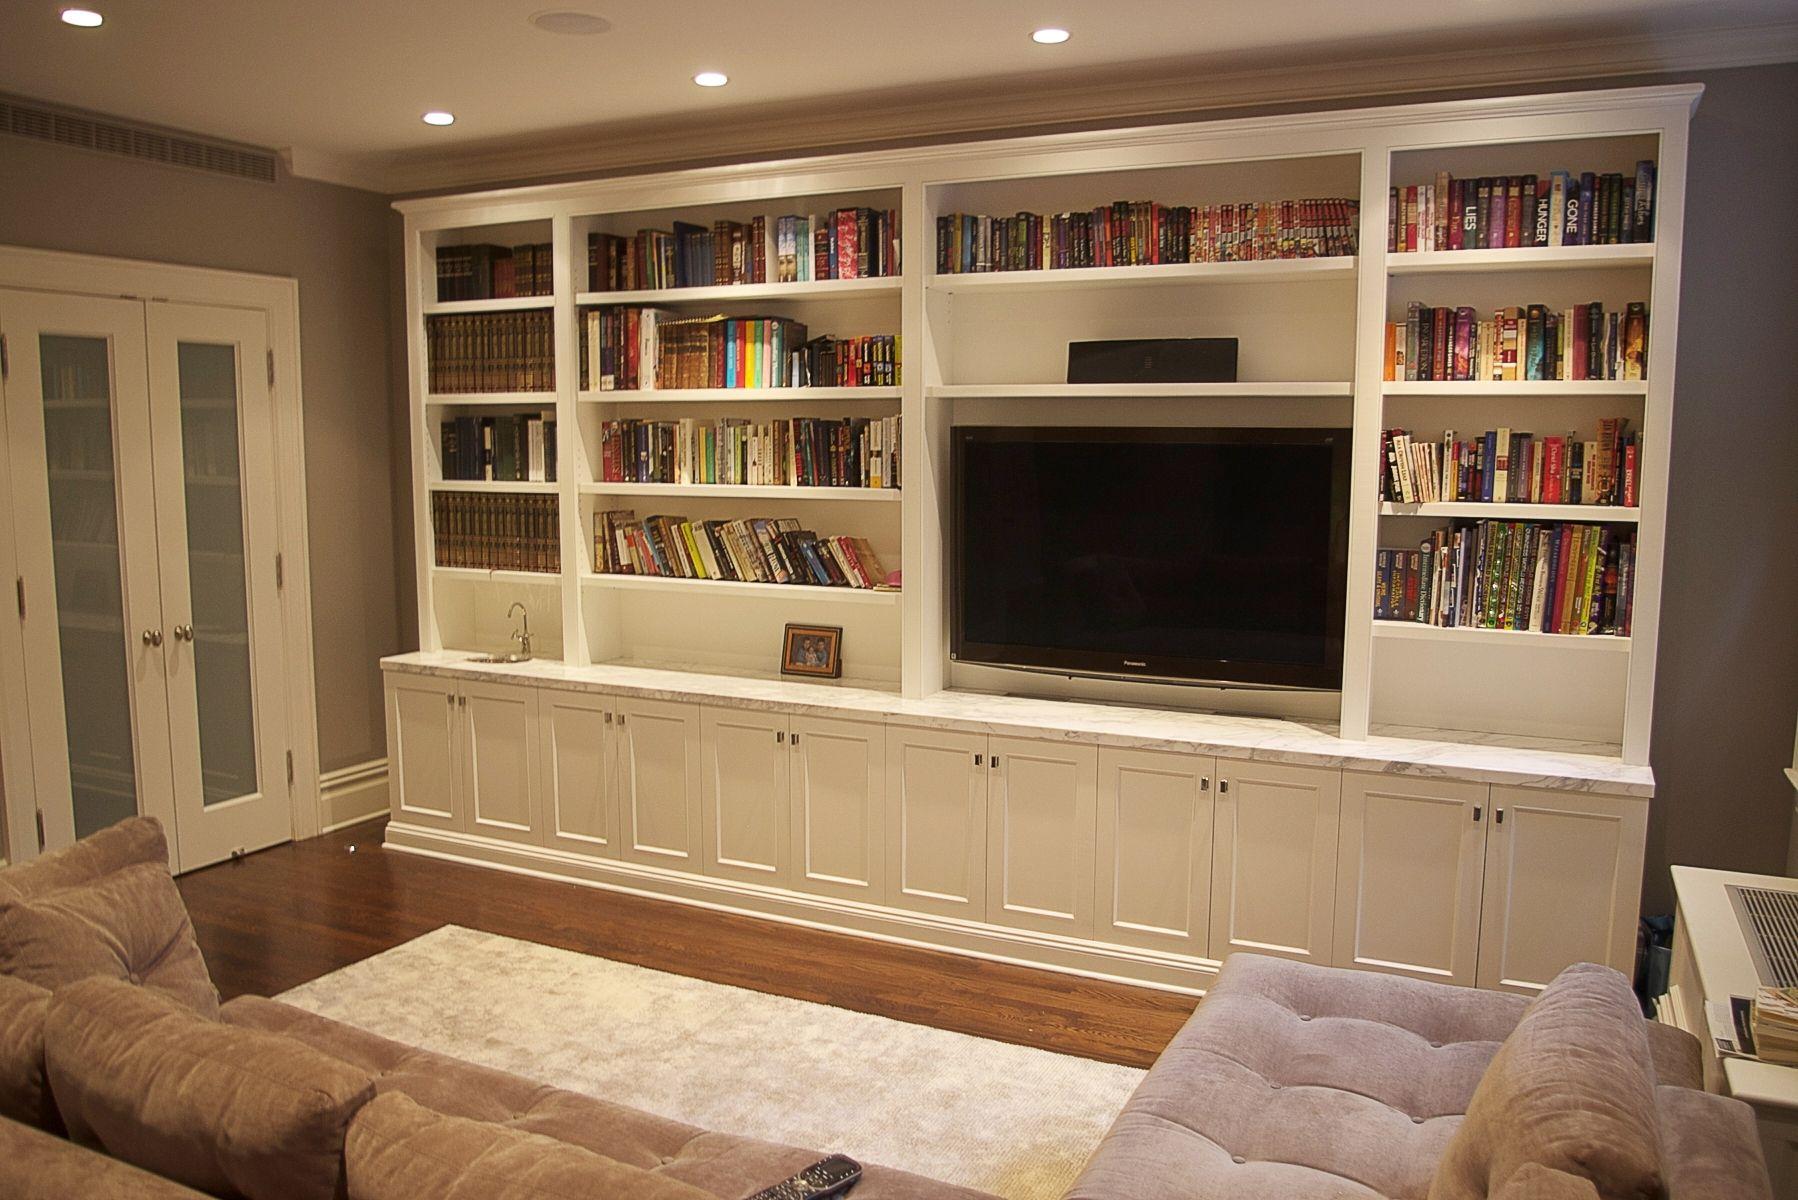 custom made living room furniture lake house photos media unit by codfish park design llc